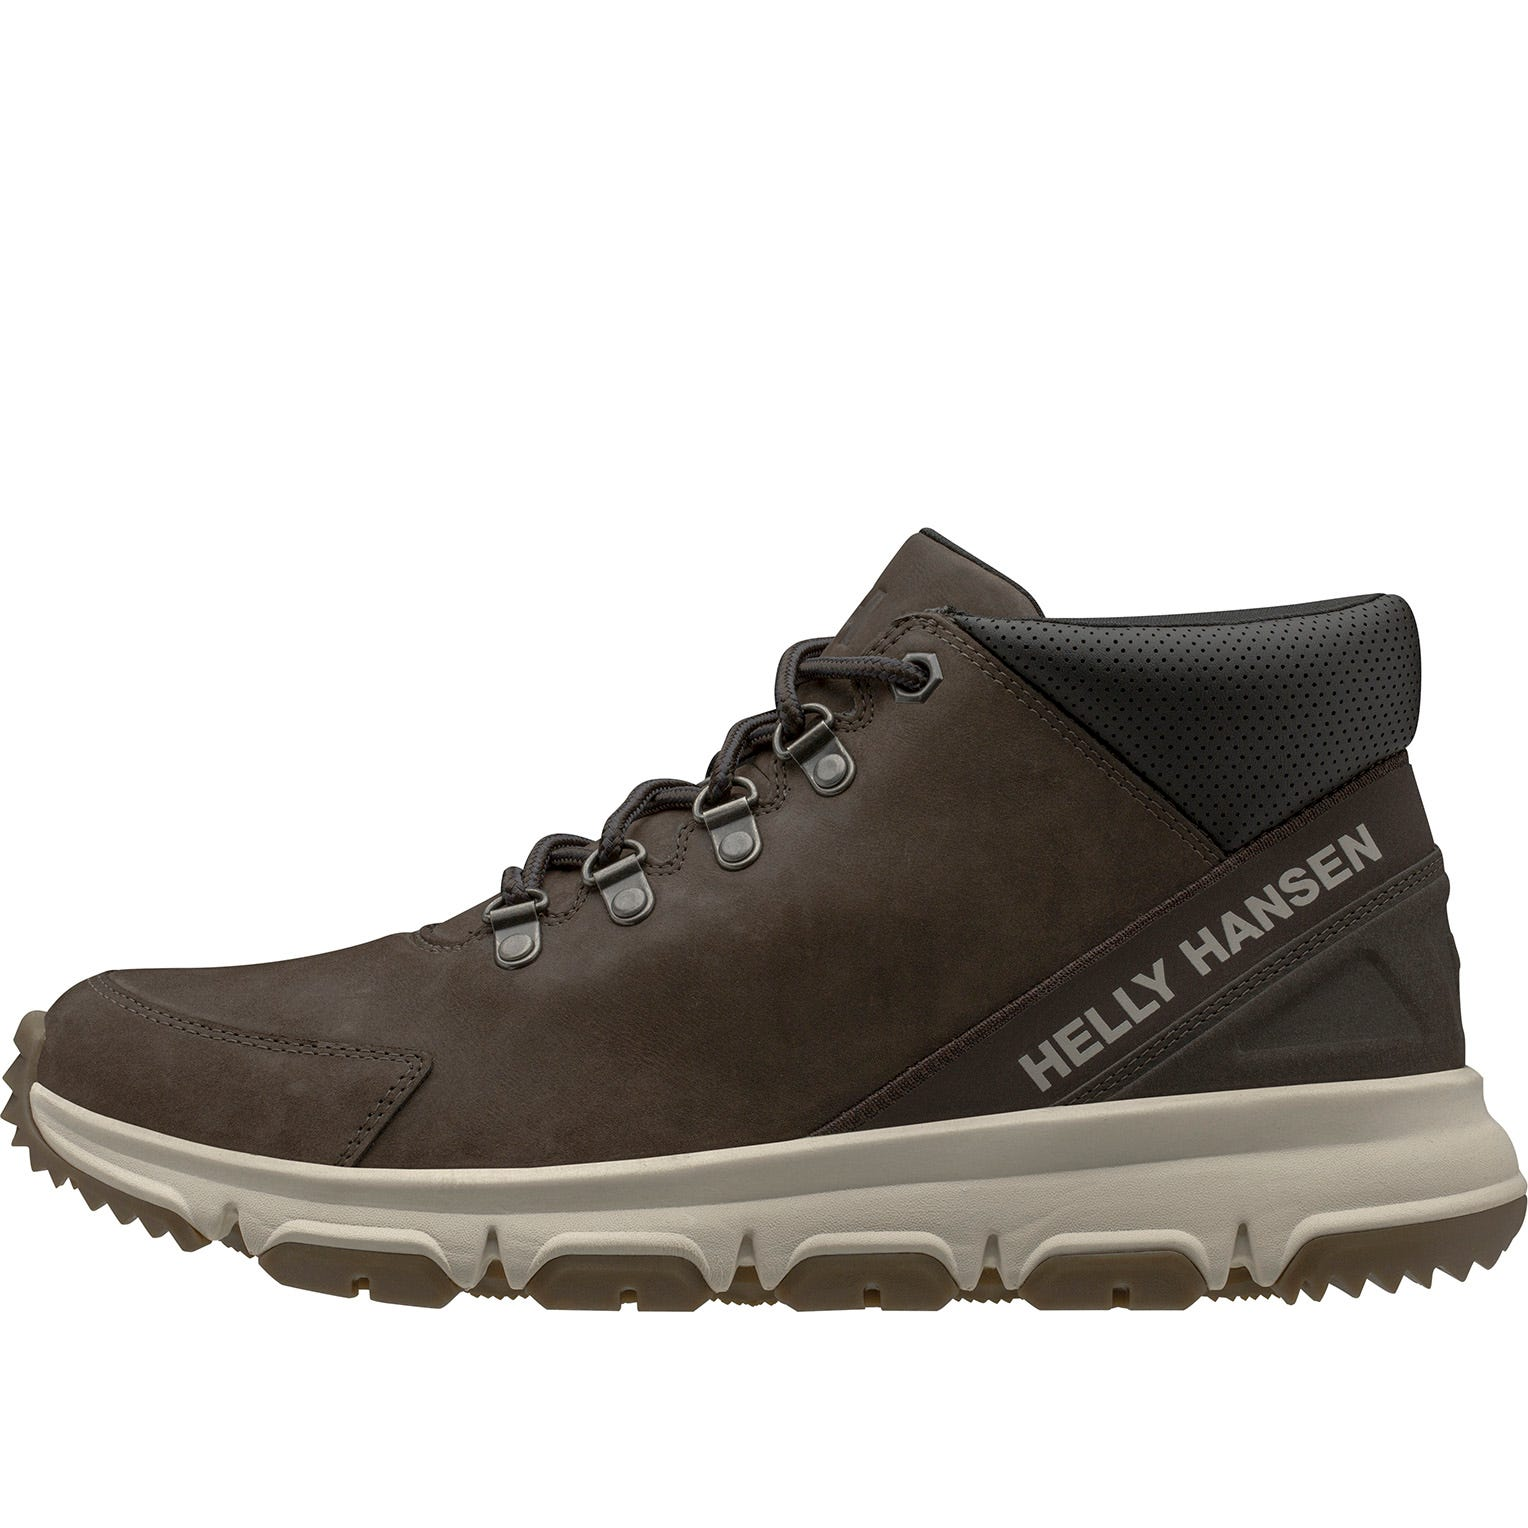 Helly Hansen Mens Fendvard Waterproof Leather Boots 11.5